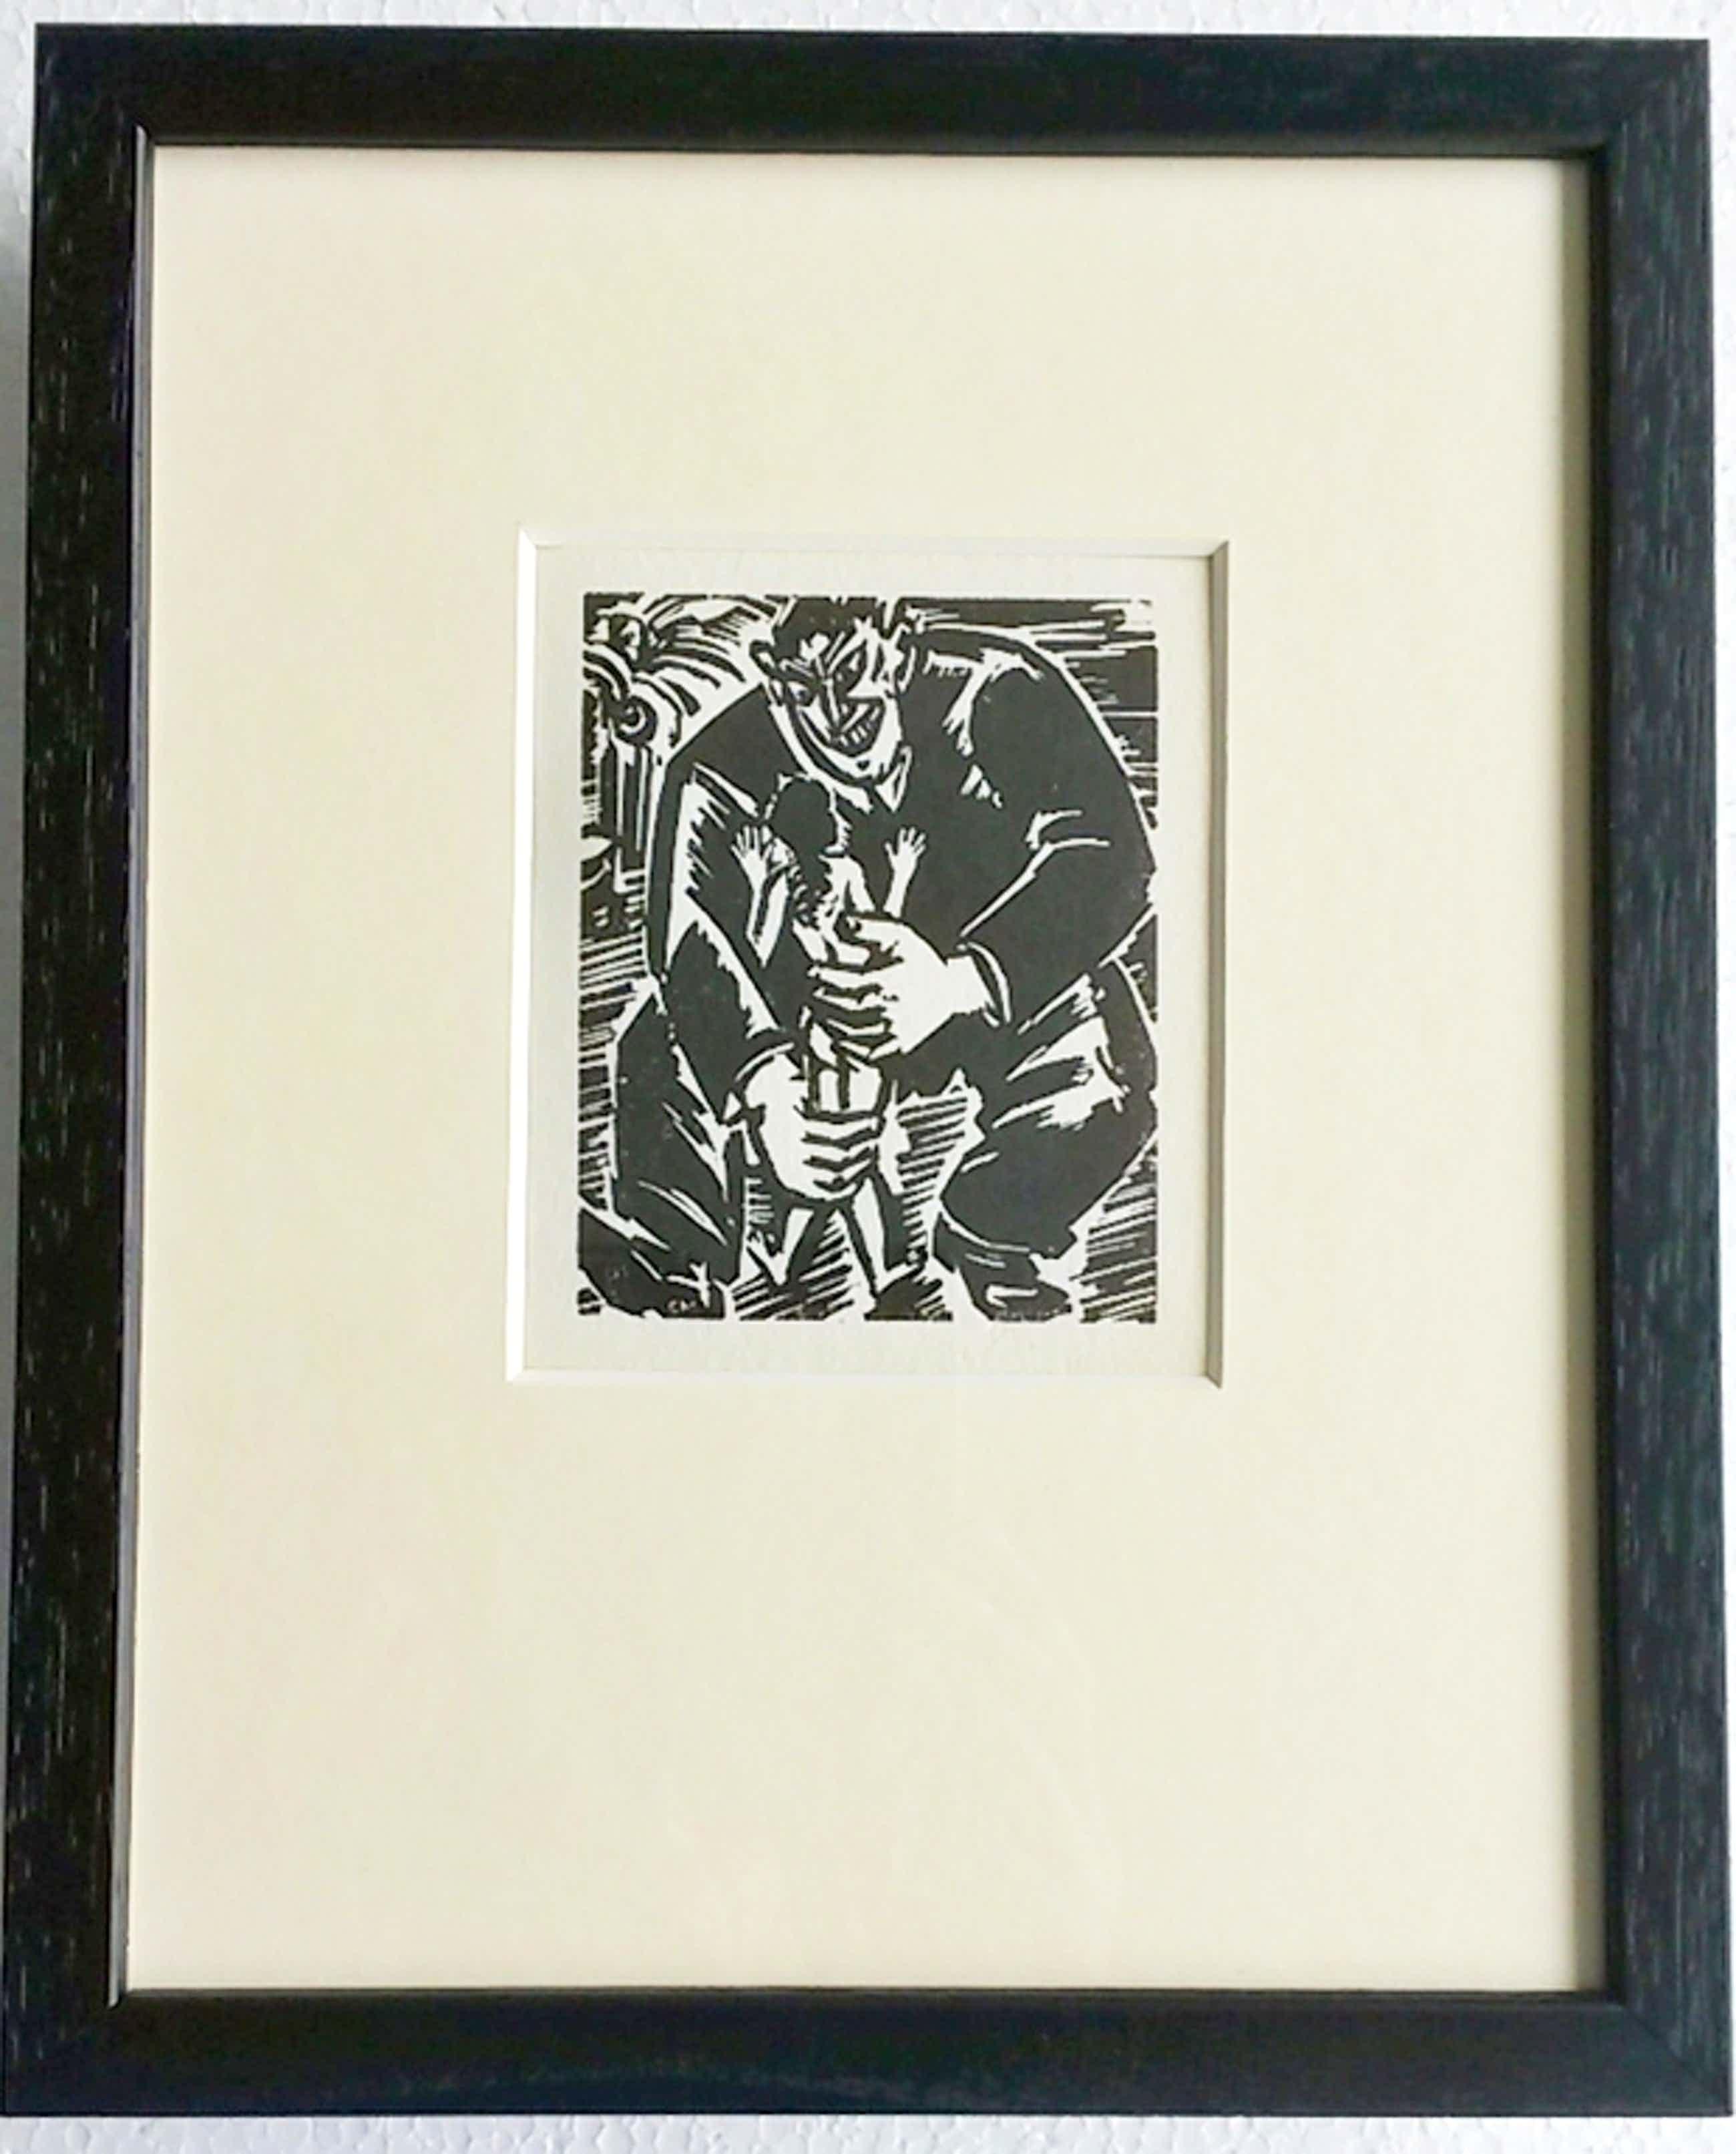 Frans Masereel, houtsnede: Begierde, 1949 kopen? Bied vanaf 55!